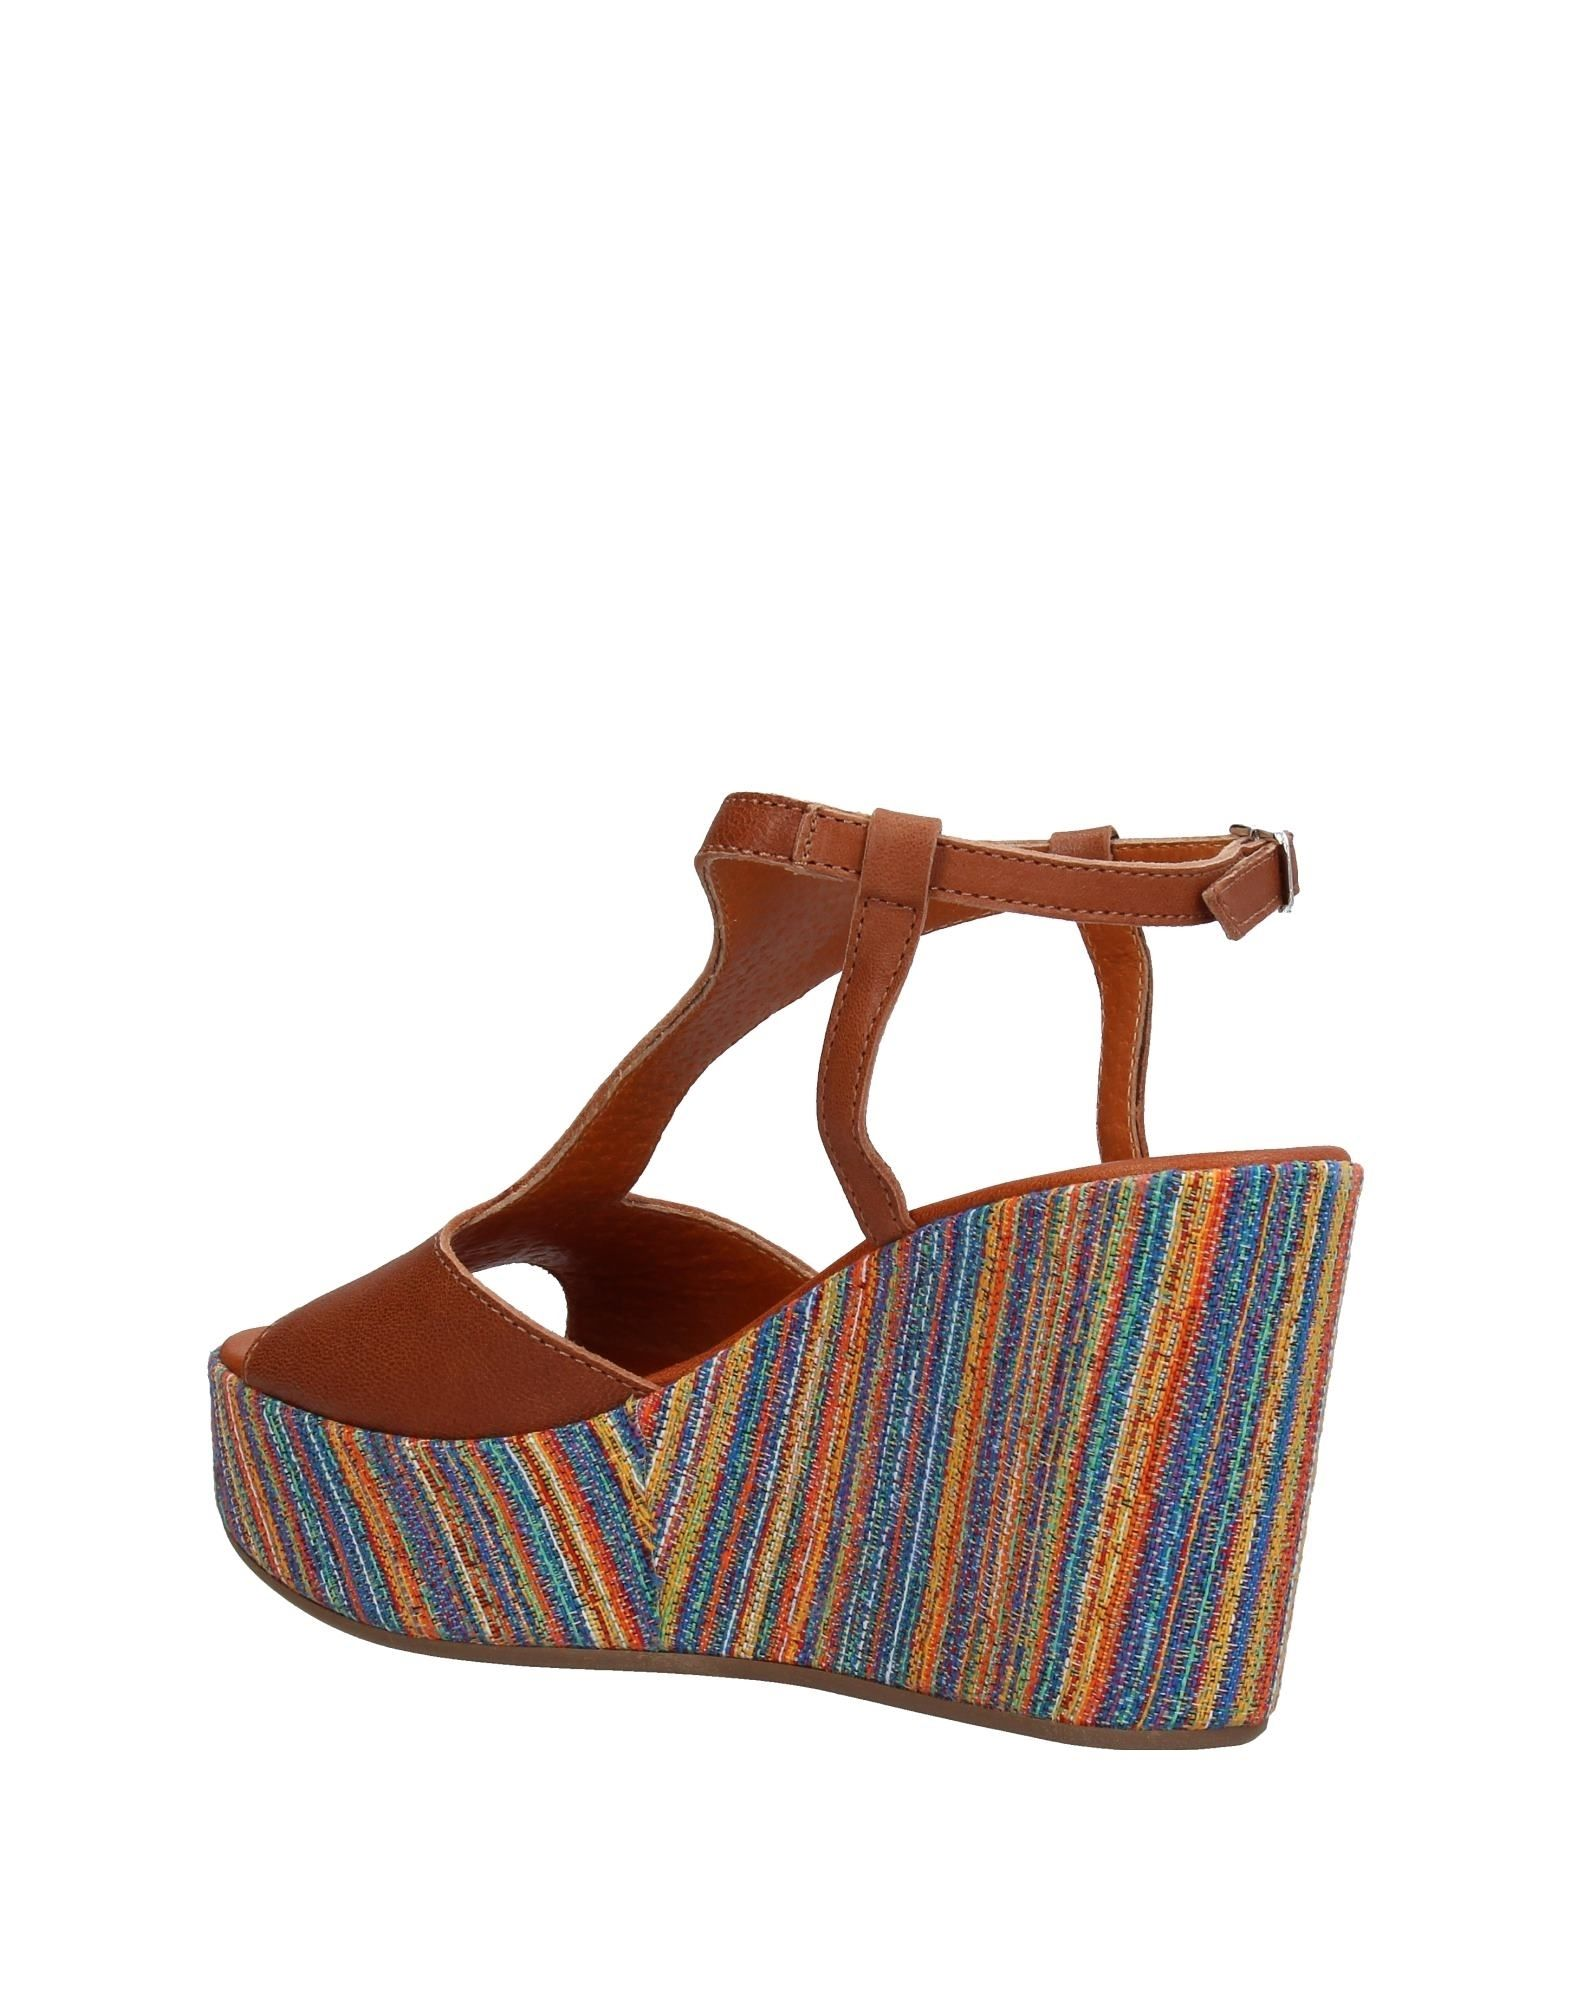 Moda Sandali Sandali Moda Oroscuro Donna - 11376168GN 2de99e